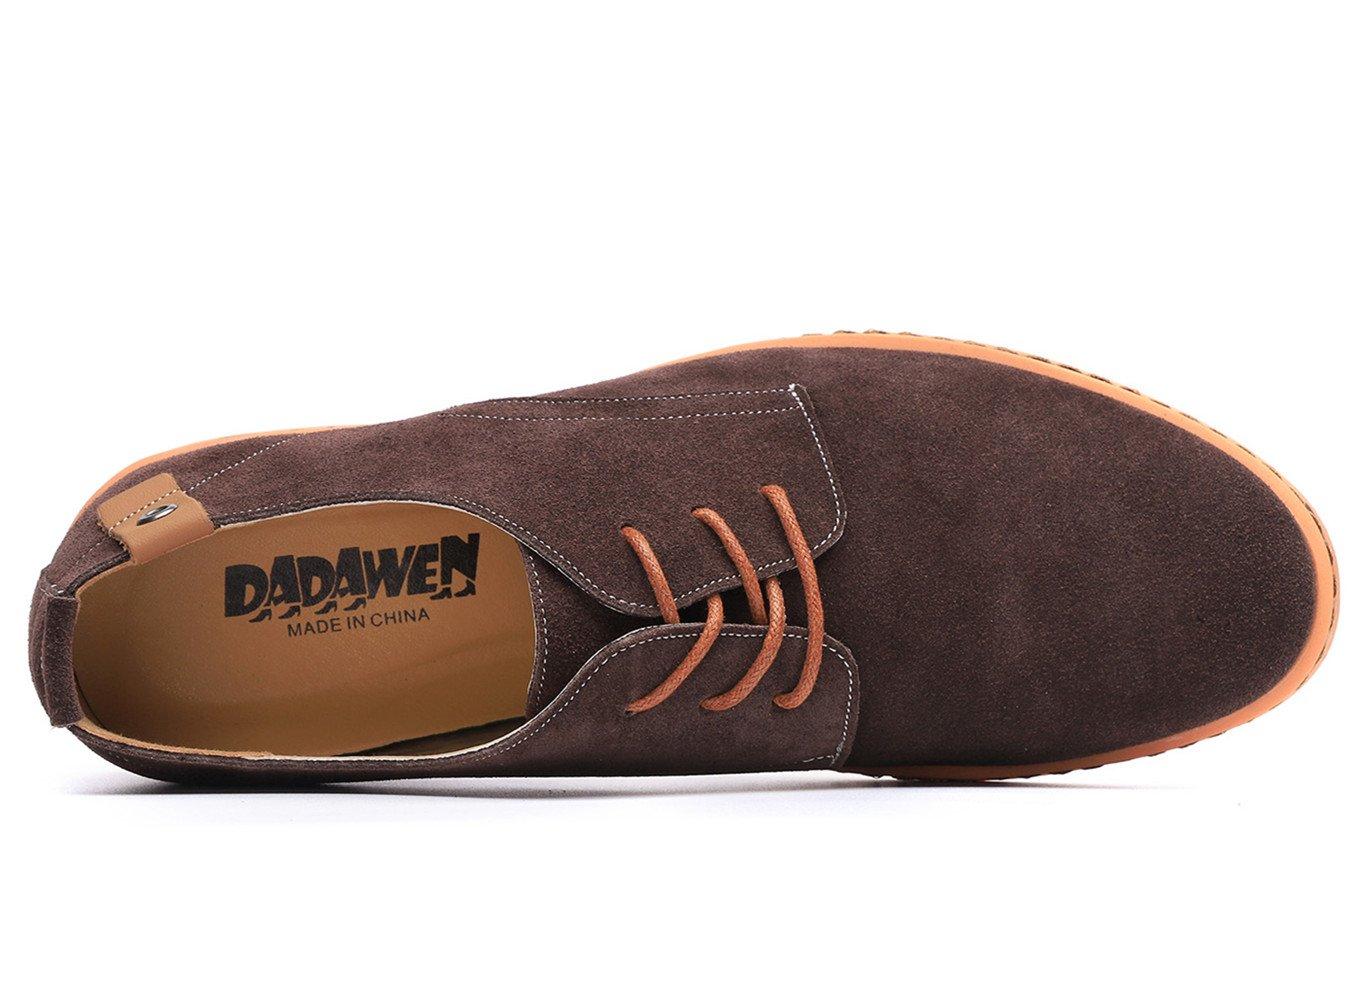 Dadawen Men's Brown Leather Oxford Shoe - 11 D(M) US by DADAWEN (Image #5)